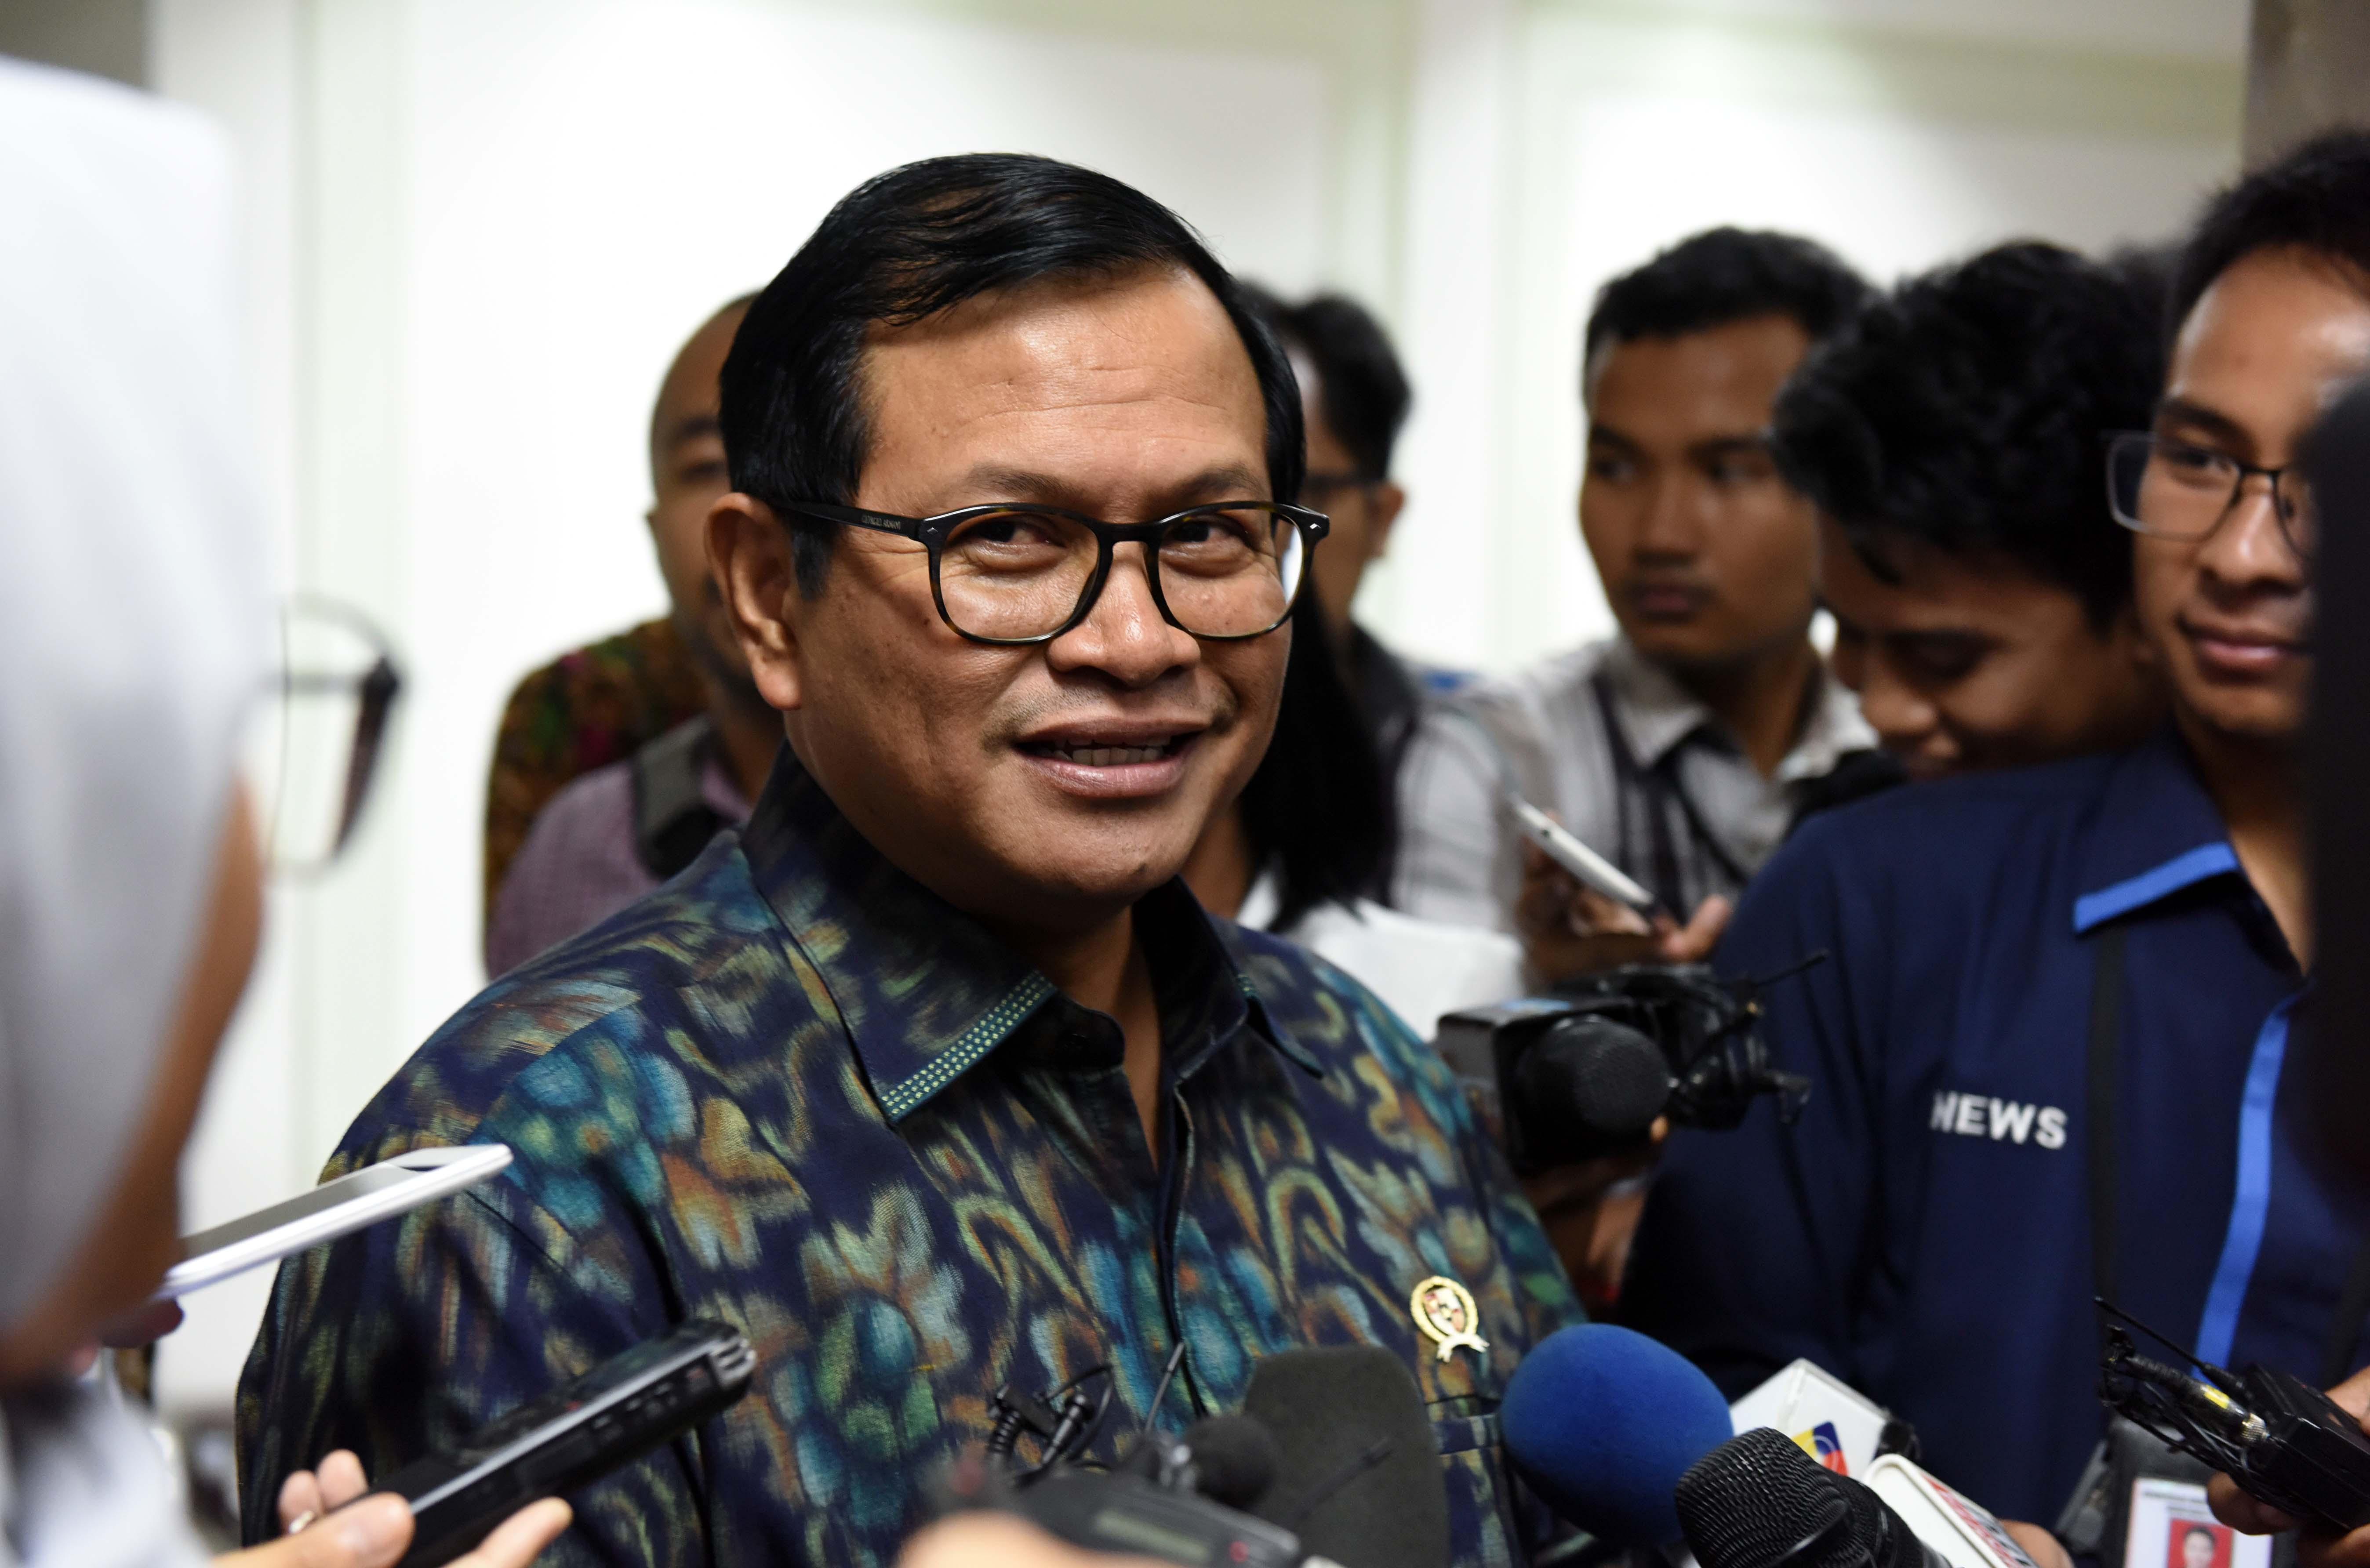 Sekretaris Kabinet (Seskab) Pramono Anung menjawab pertanyaan wartawan usai mengikuti Rapat Terbatas, di Kantor Presiden, Jakarta, Selasa (21/3). (Foto: Humas/Jay)